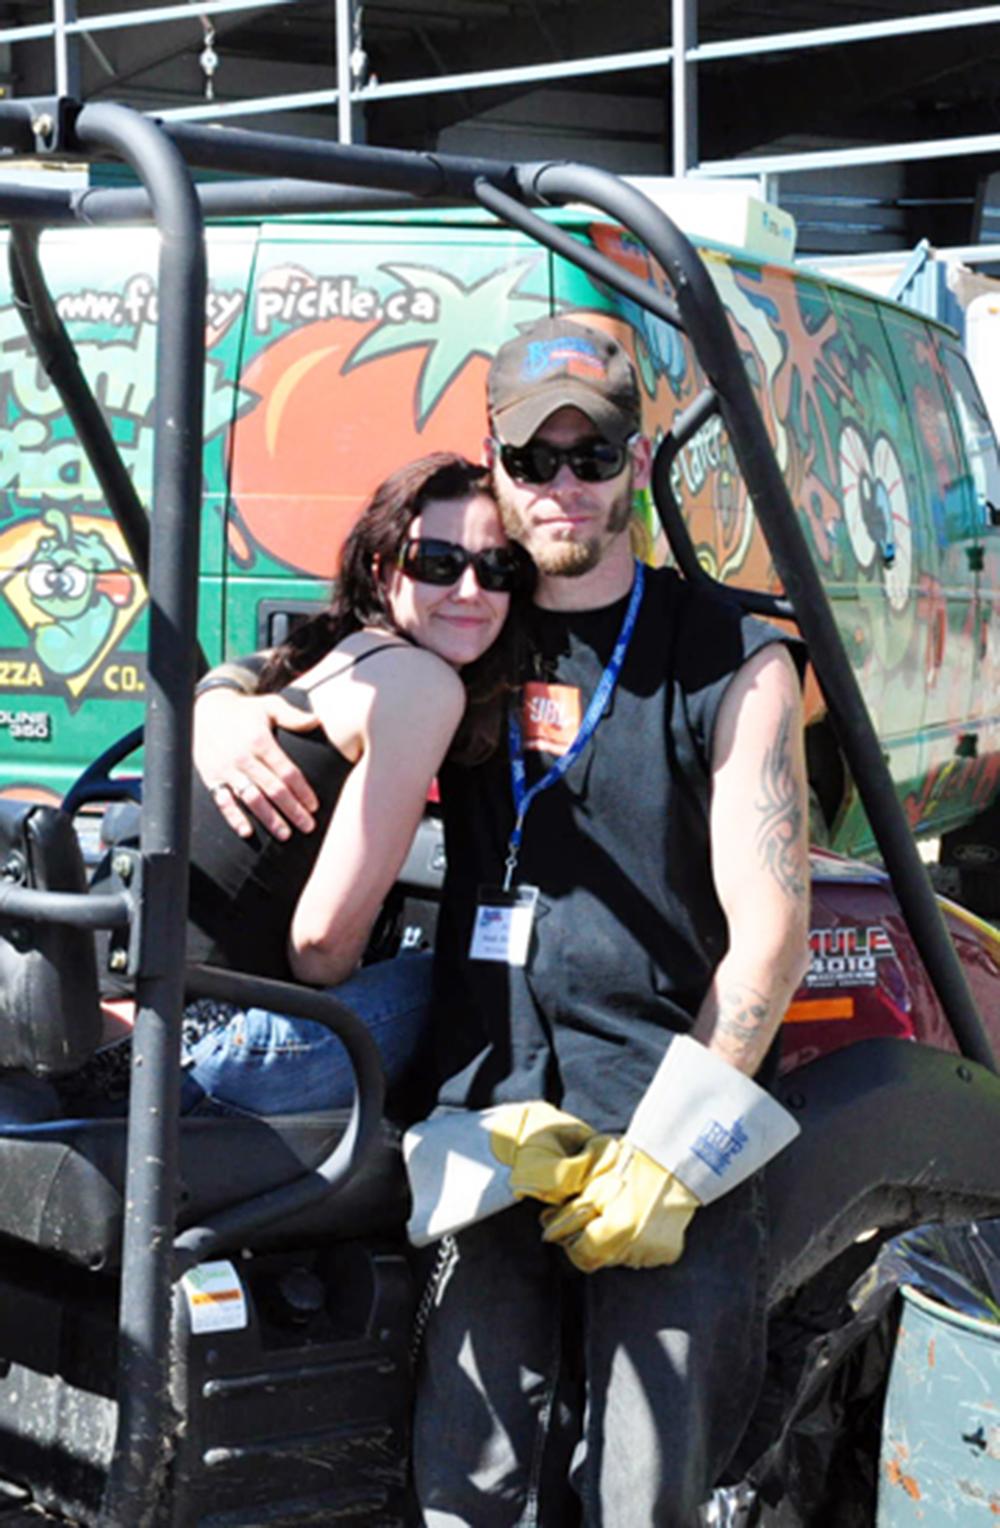 2011 - Volunteer Heath Sliter with his friend